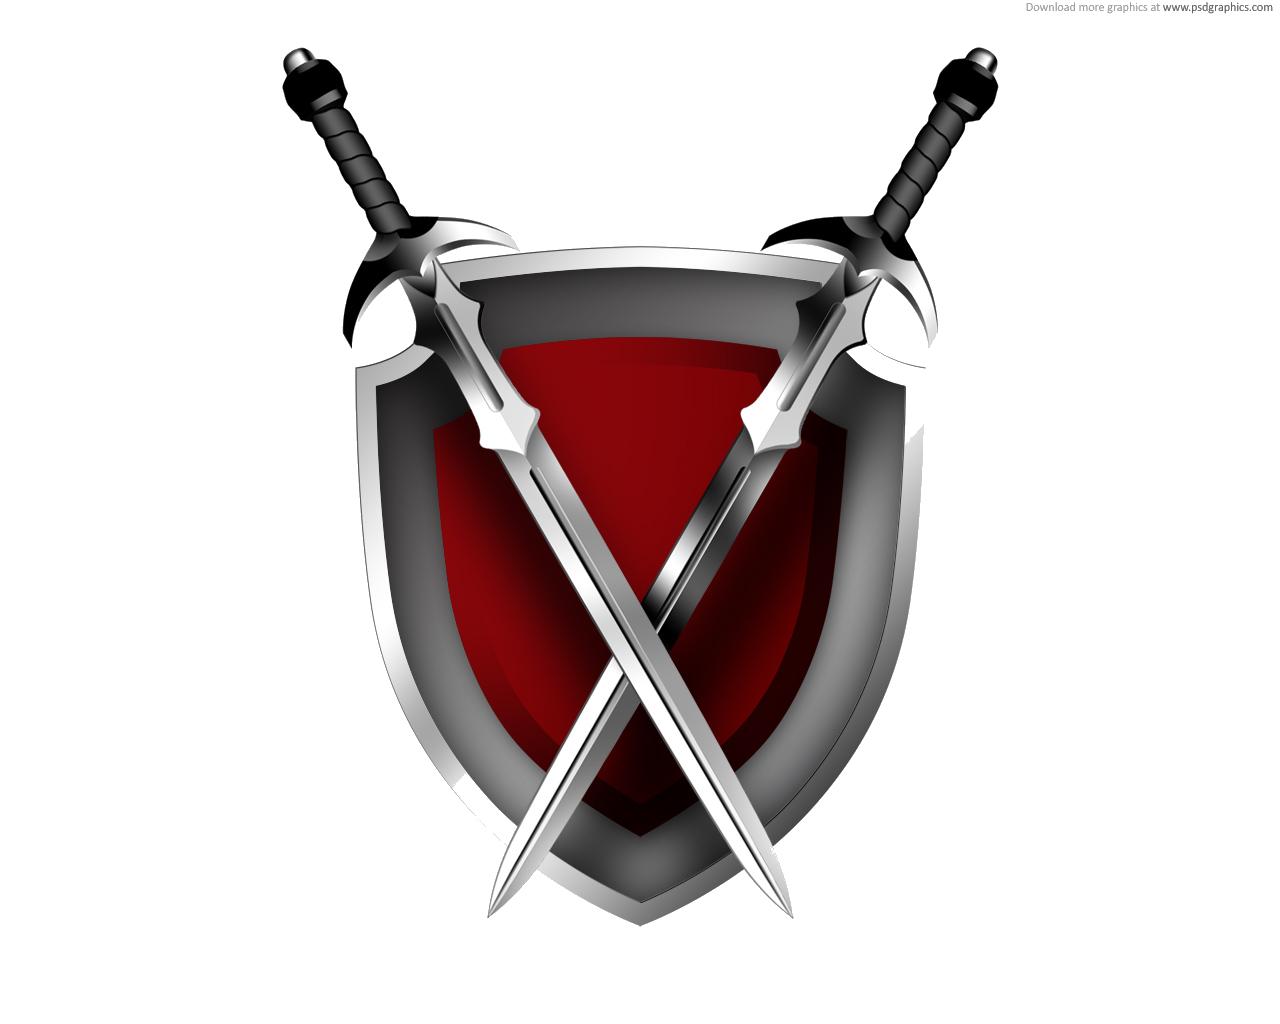 Cross swords clipart vector transparent download Cross Sword PNG Transparent Image | PNG Mart vector transparent download